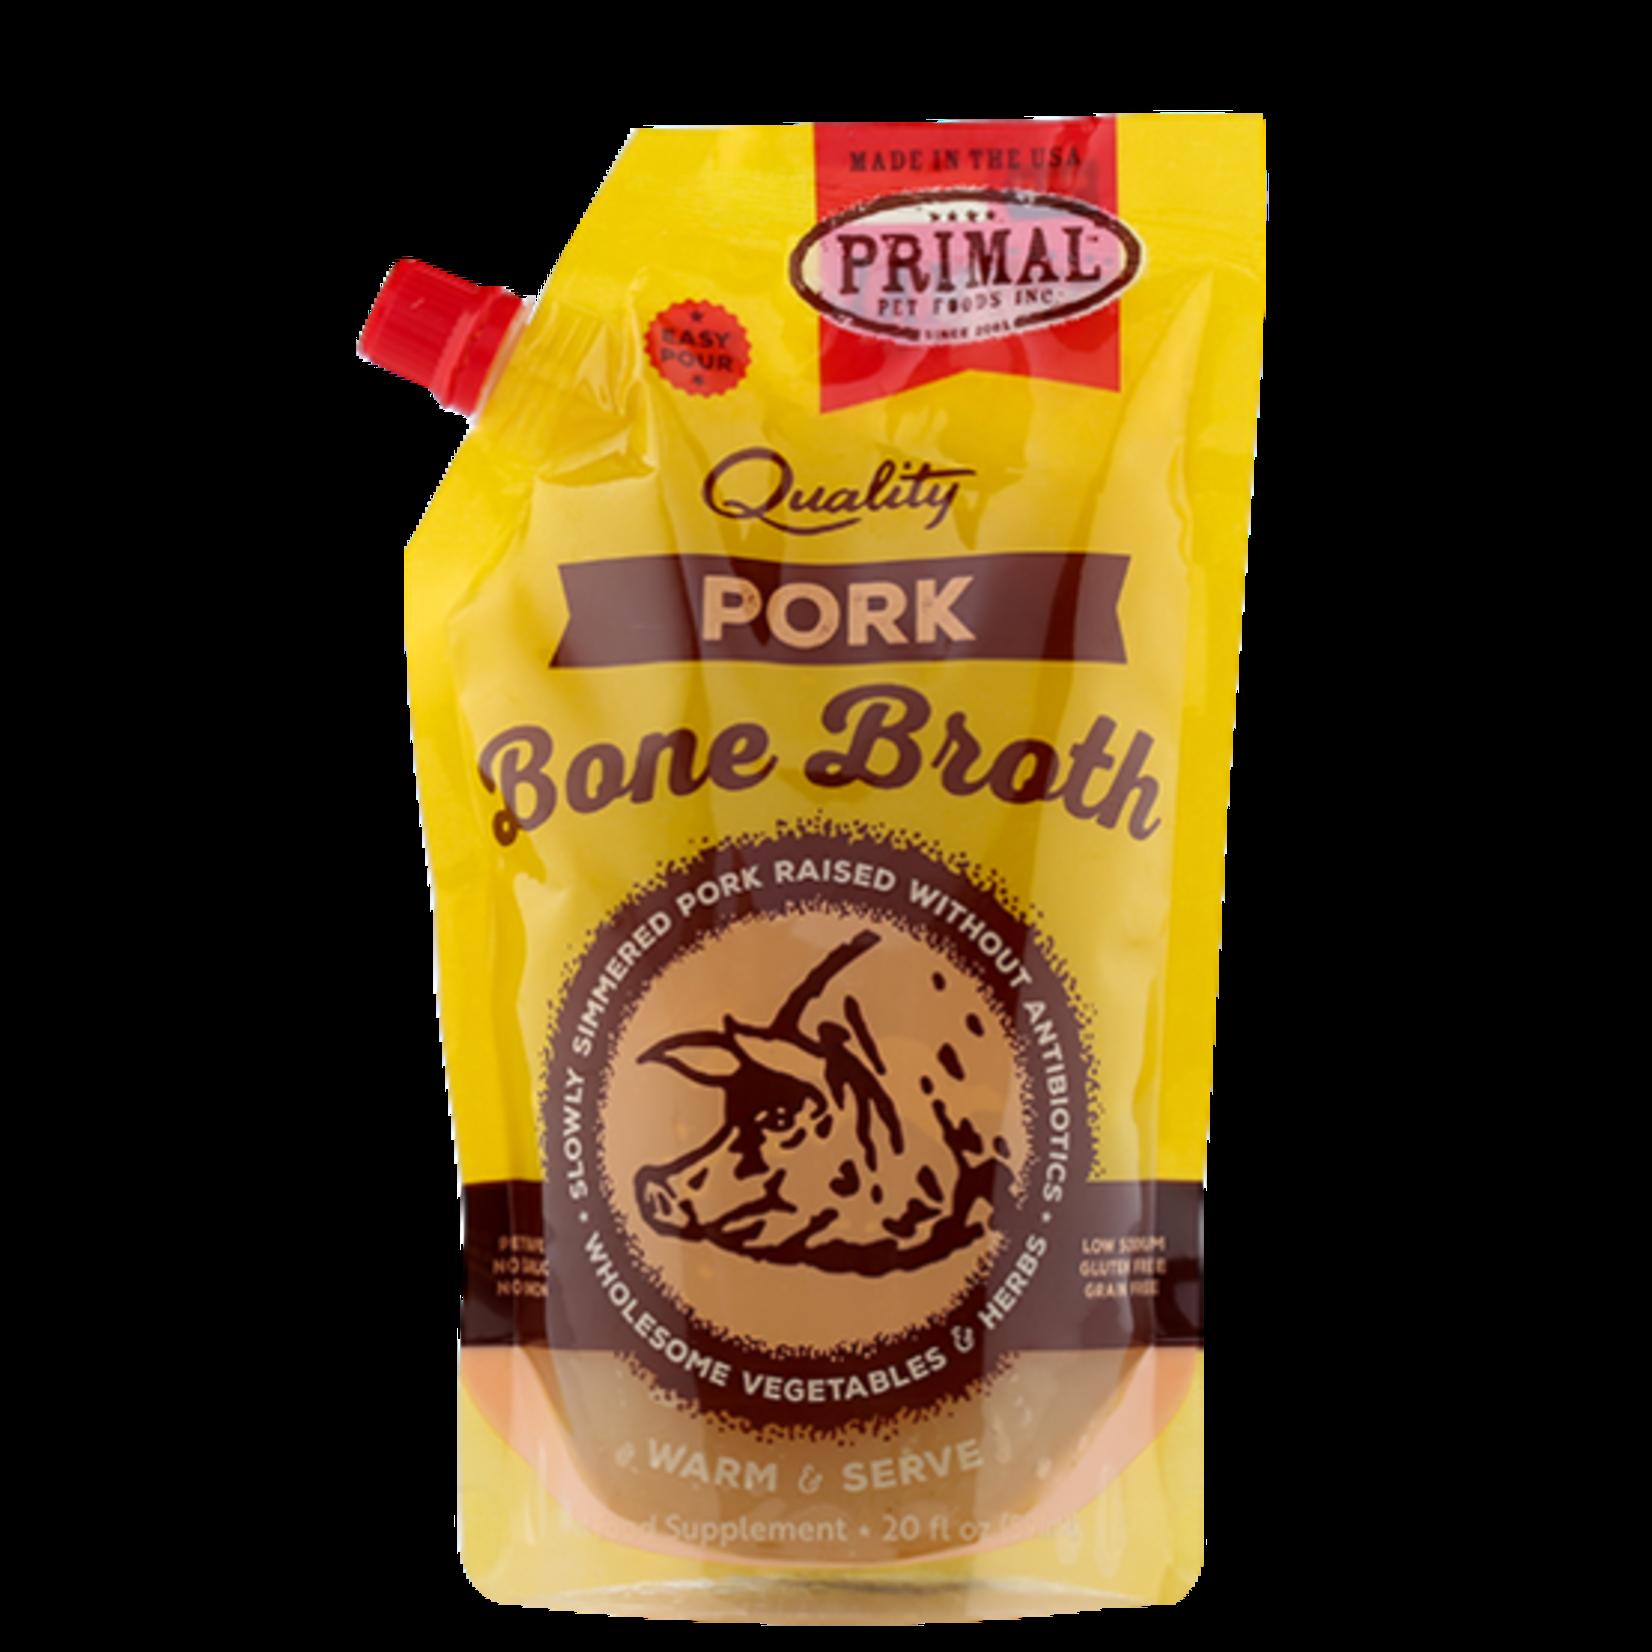 Primal Pet Foods Primal Frozen Bone Broth Pork 20 OZ